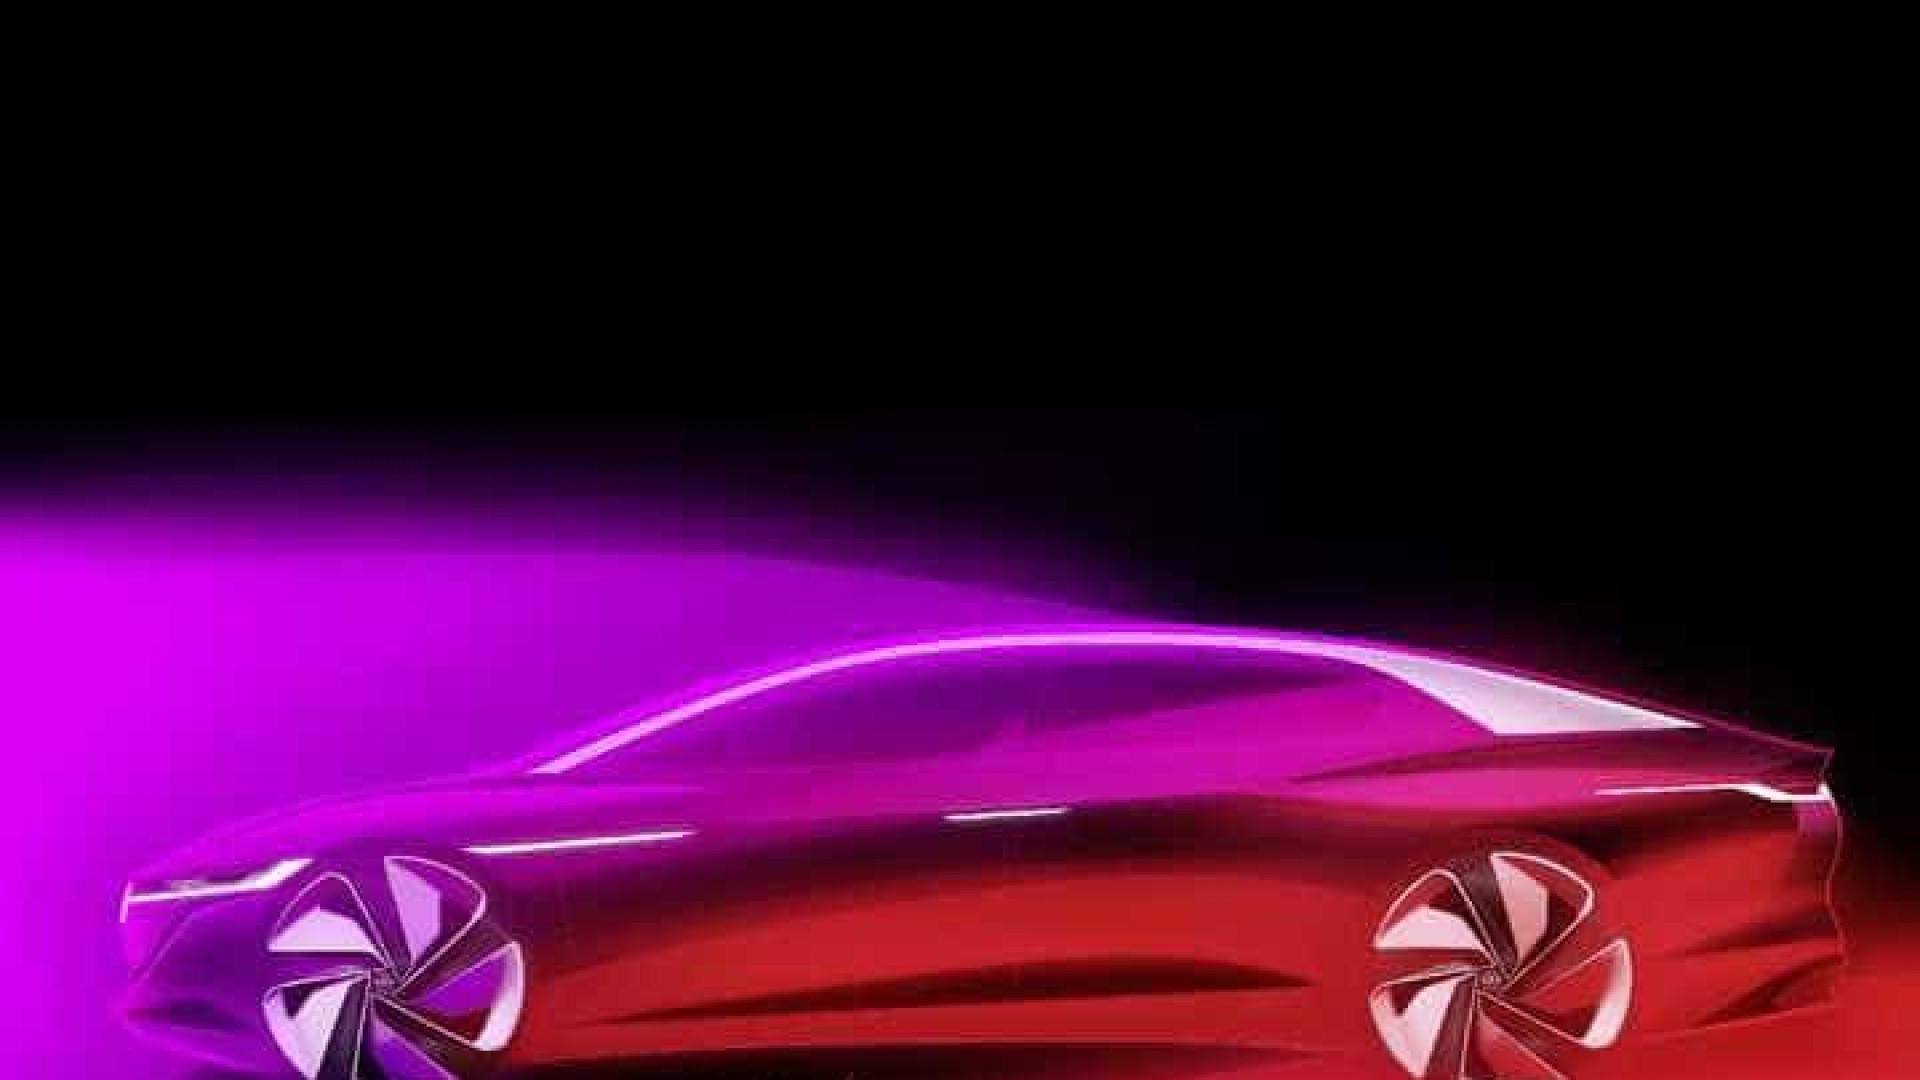 VW ID Vizzion antecipa sedã de luxo elétrico